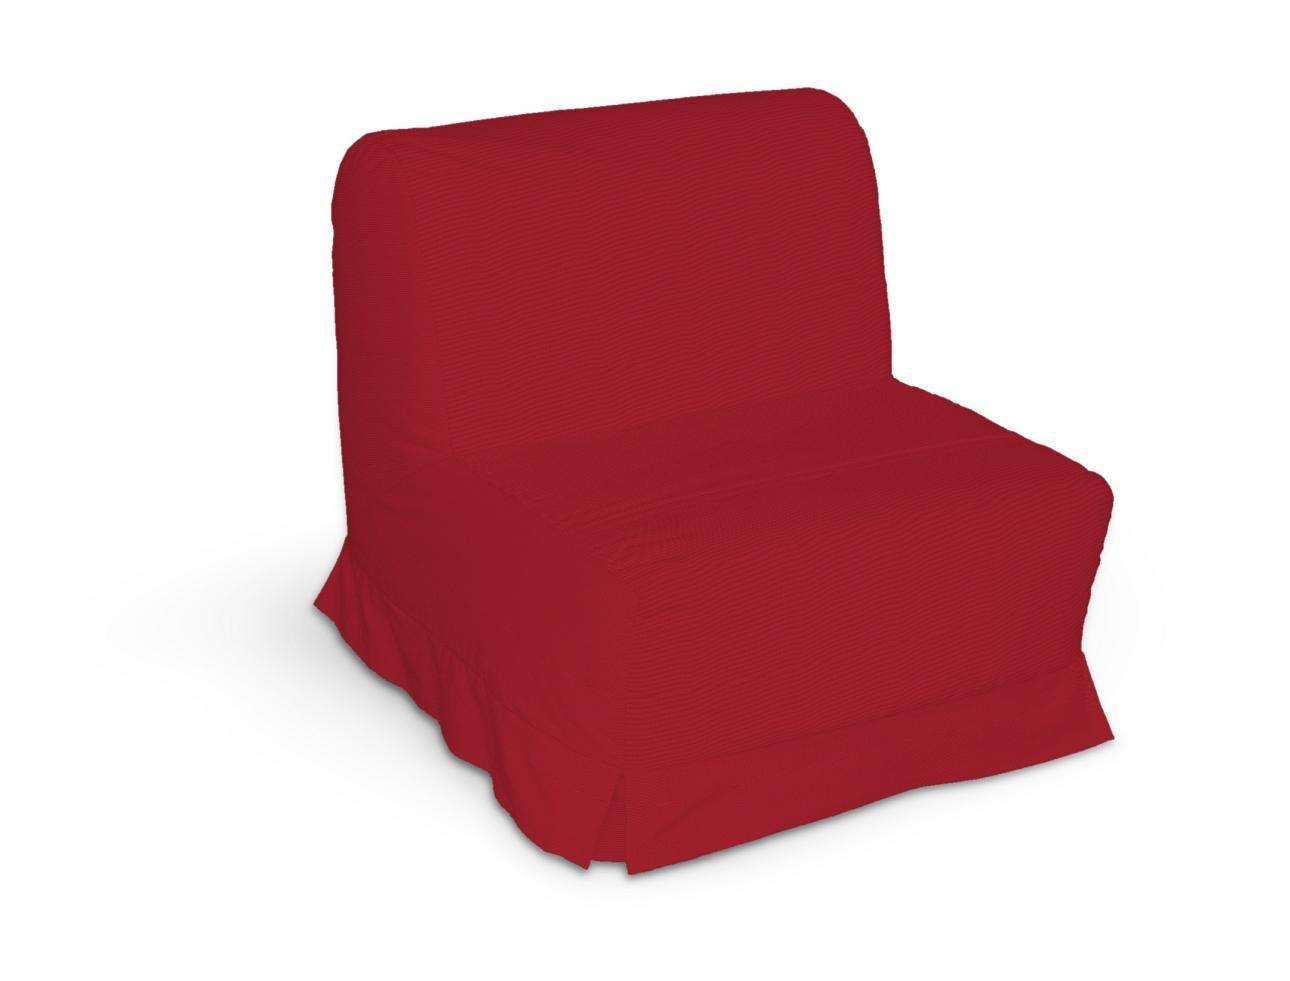 Lycksele Sesselbezug mit Kellerfalten Lycksele von der Kollektion Etna, Stoff: 705-60